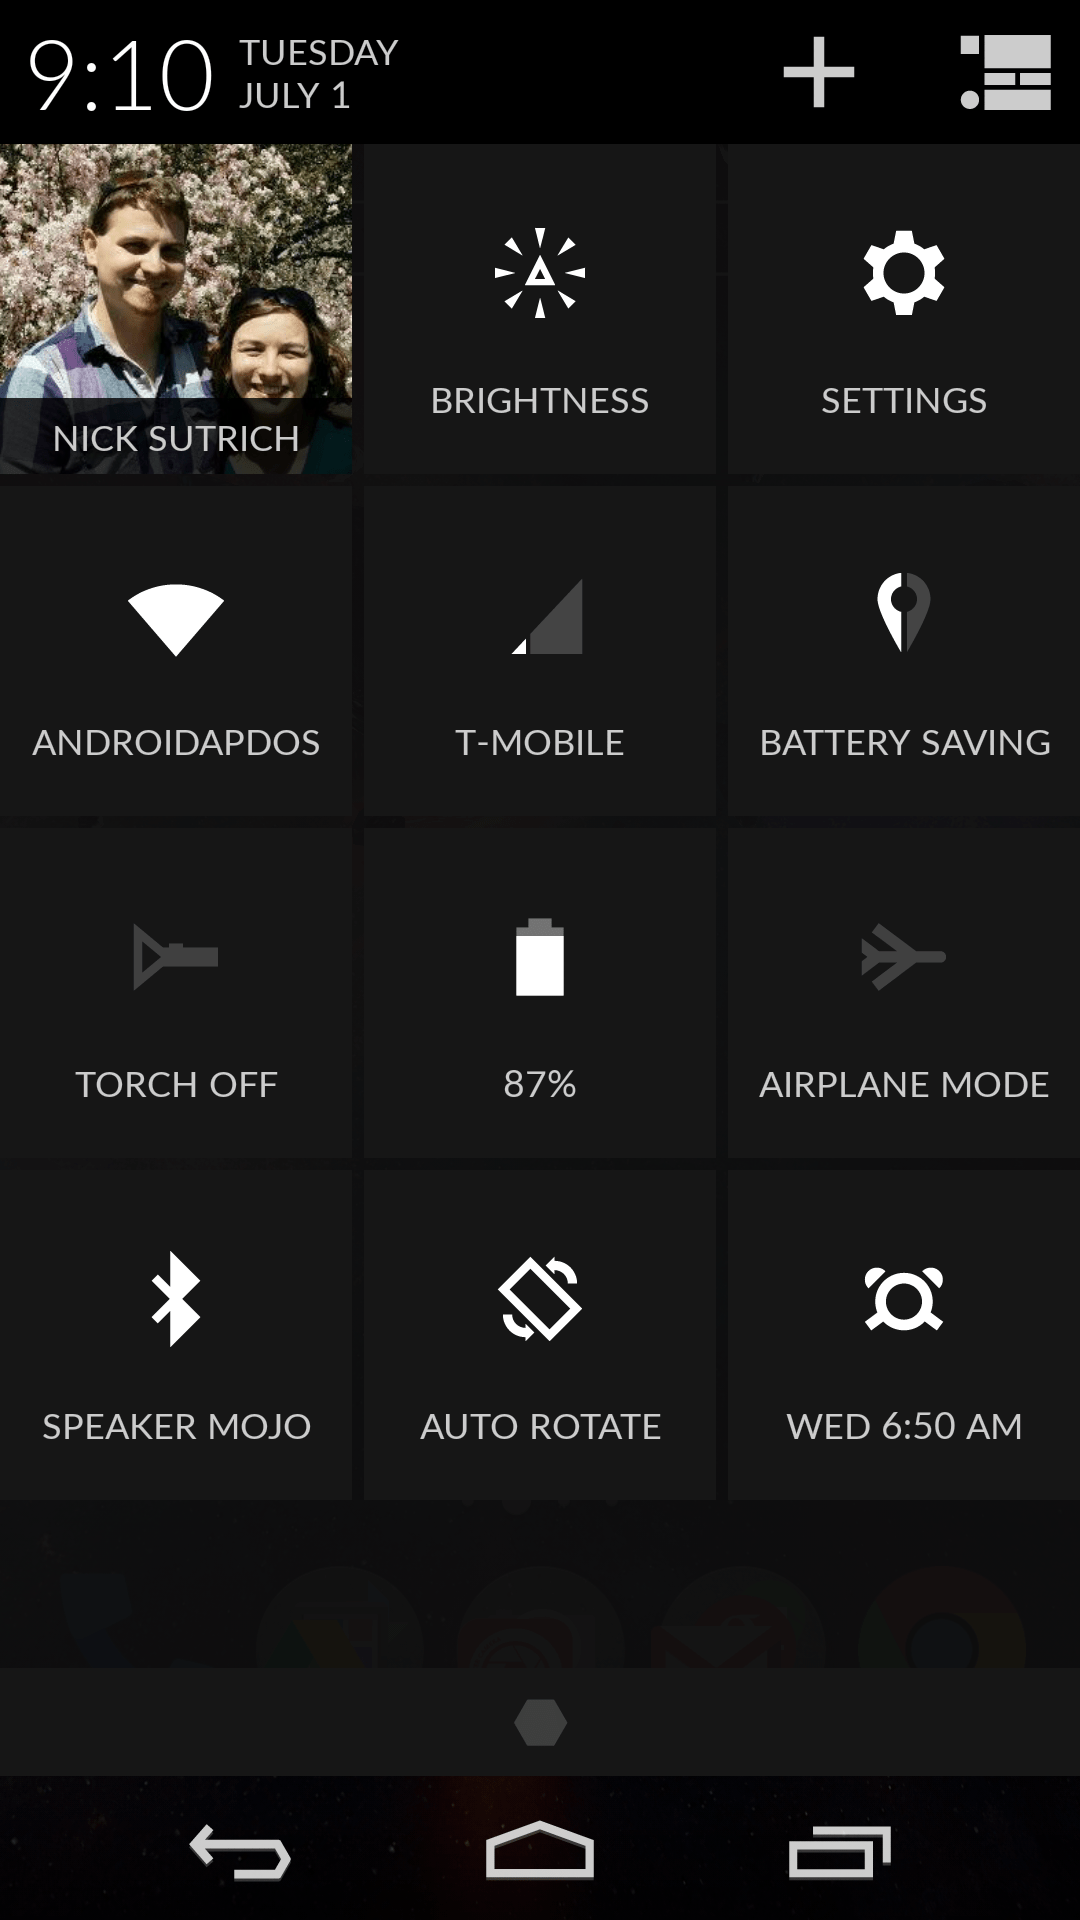 Screenshot 2014 07 01 09 10 33